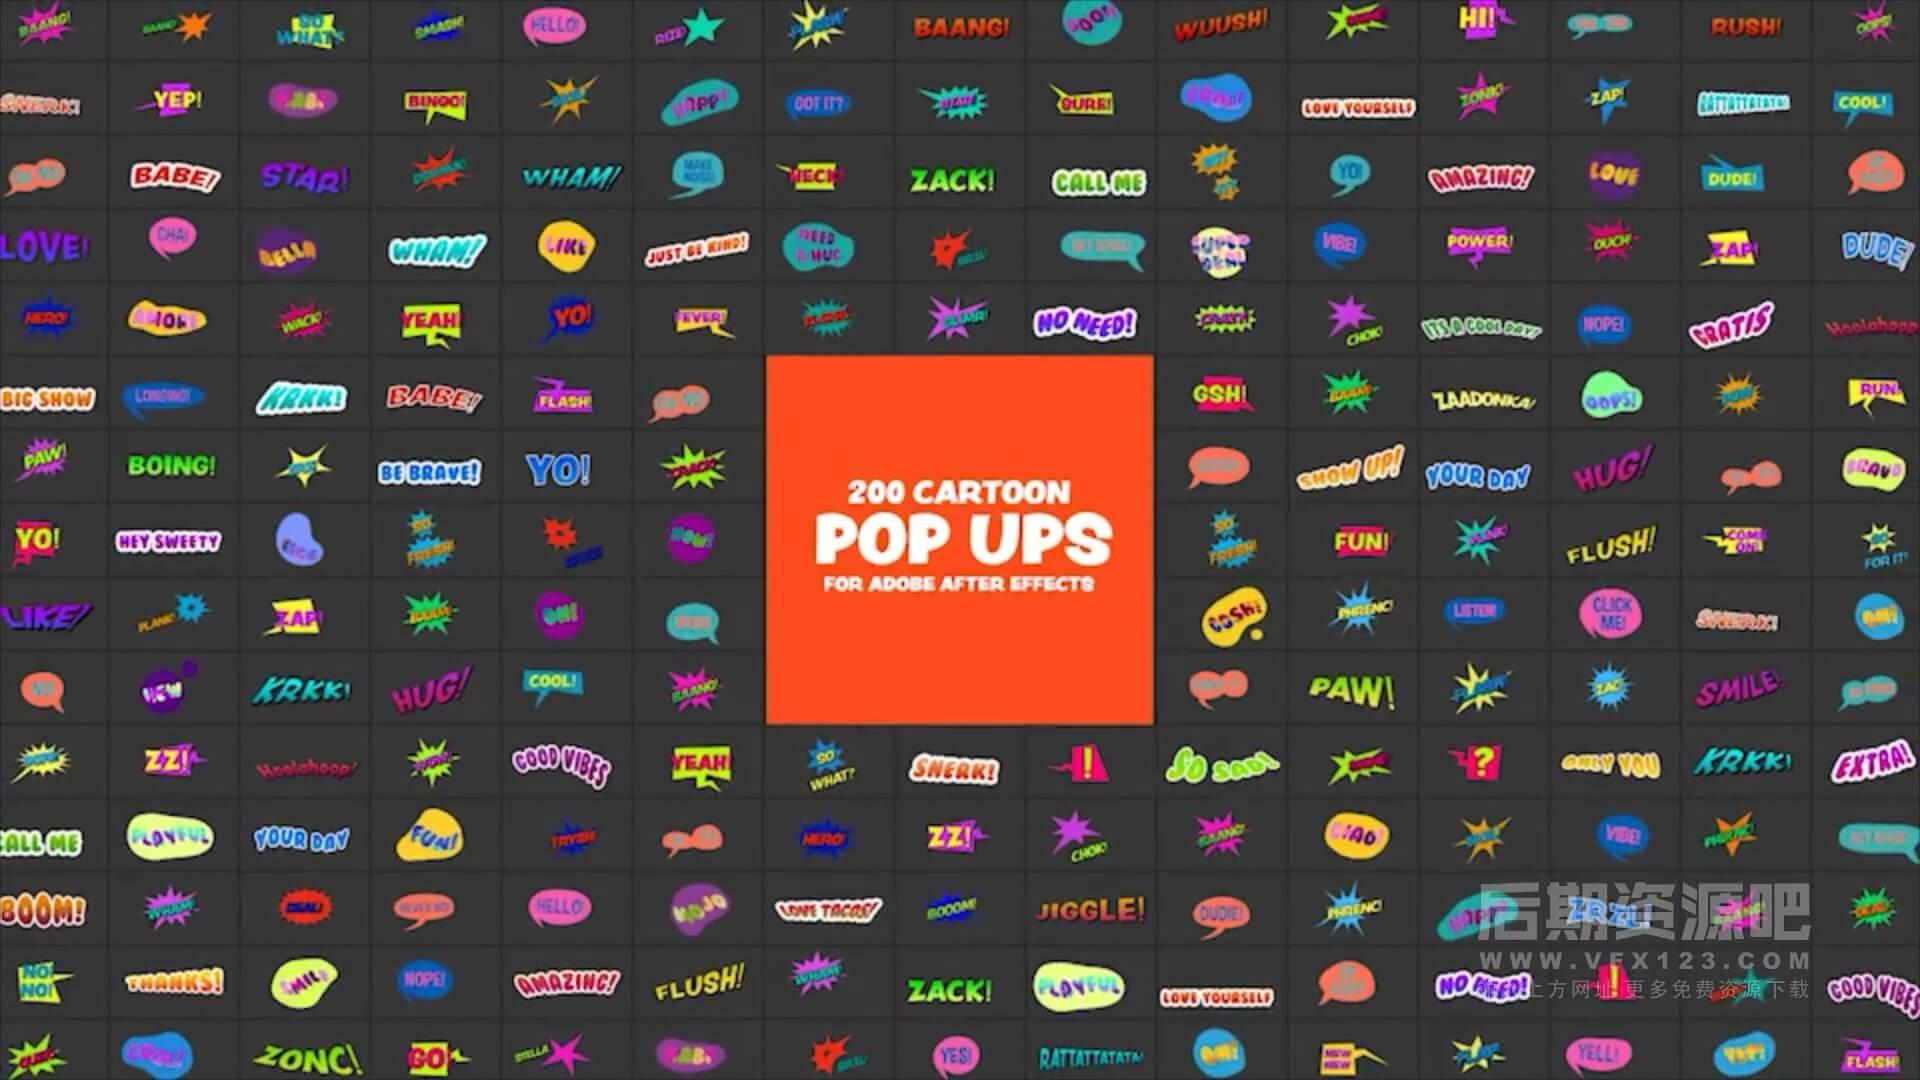 AE模板 200+卡通综艺花字气泡搞笑爆炸签动画 Cartoon Pop-Ups